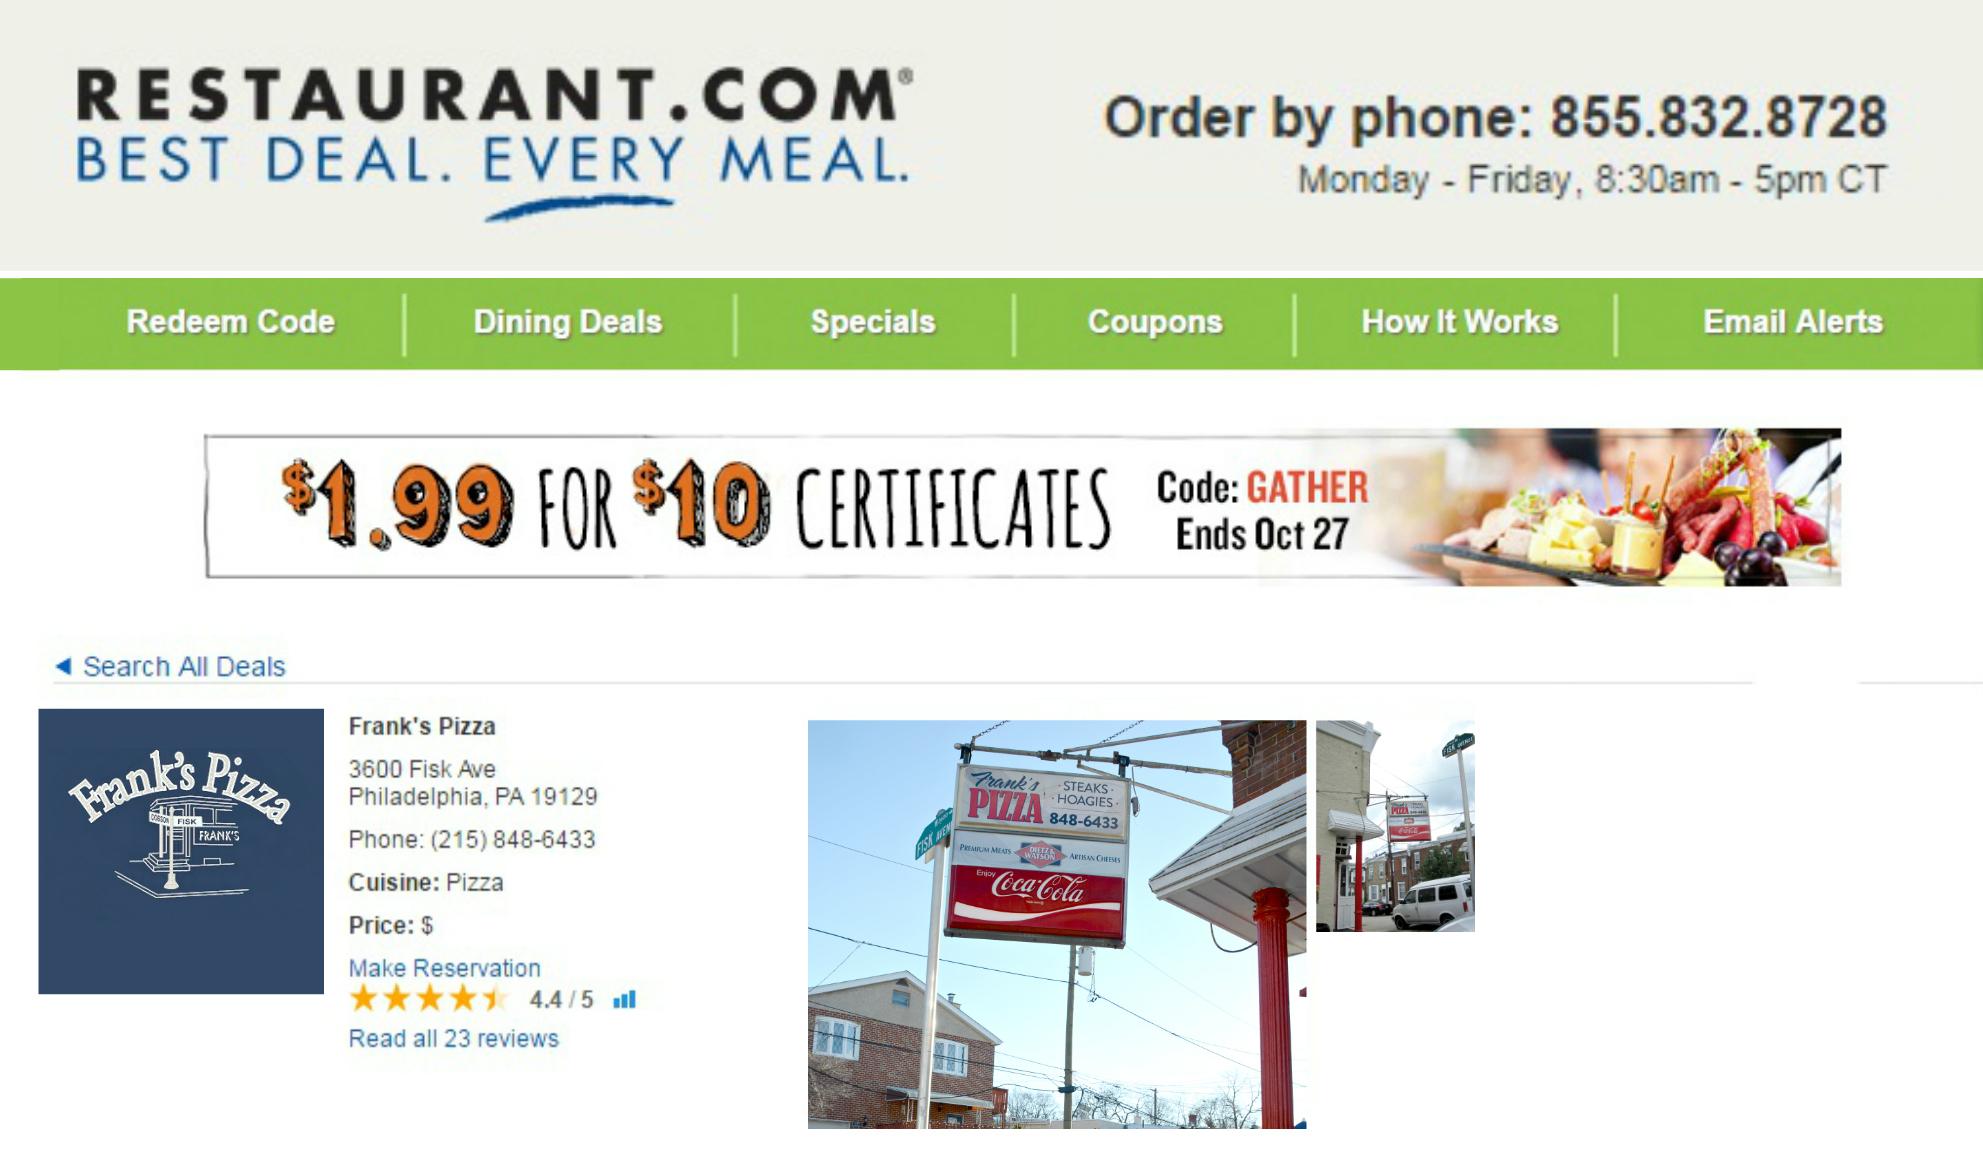 eastfallslocal-restaurants-dot-com-ad